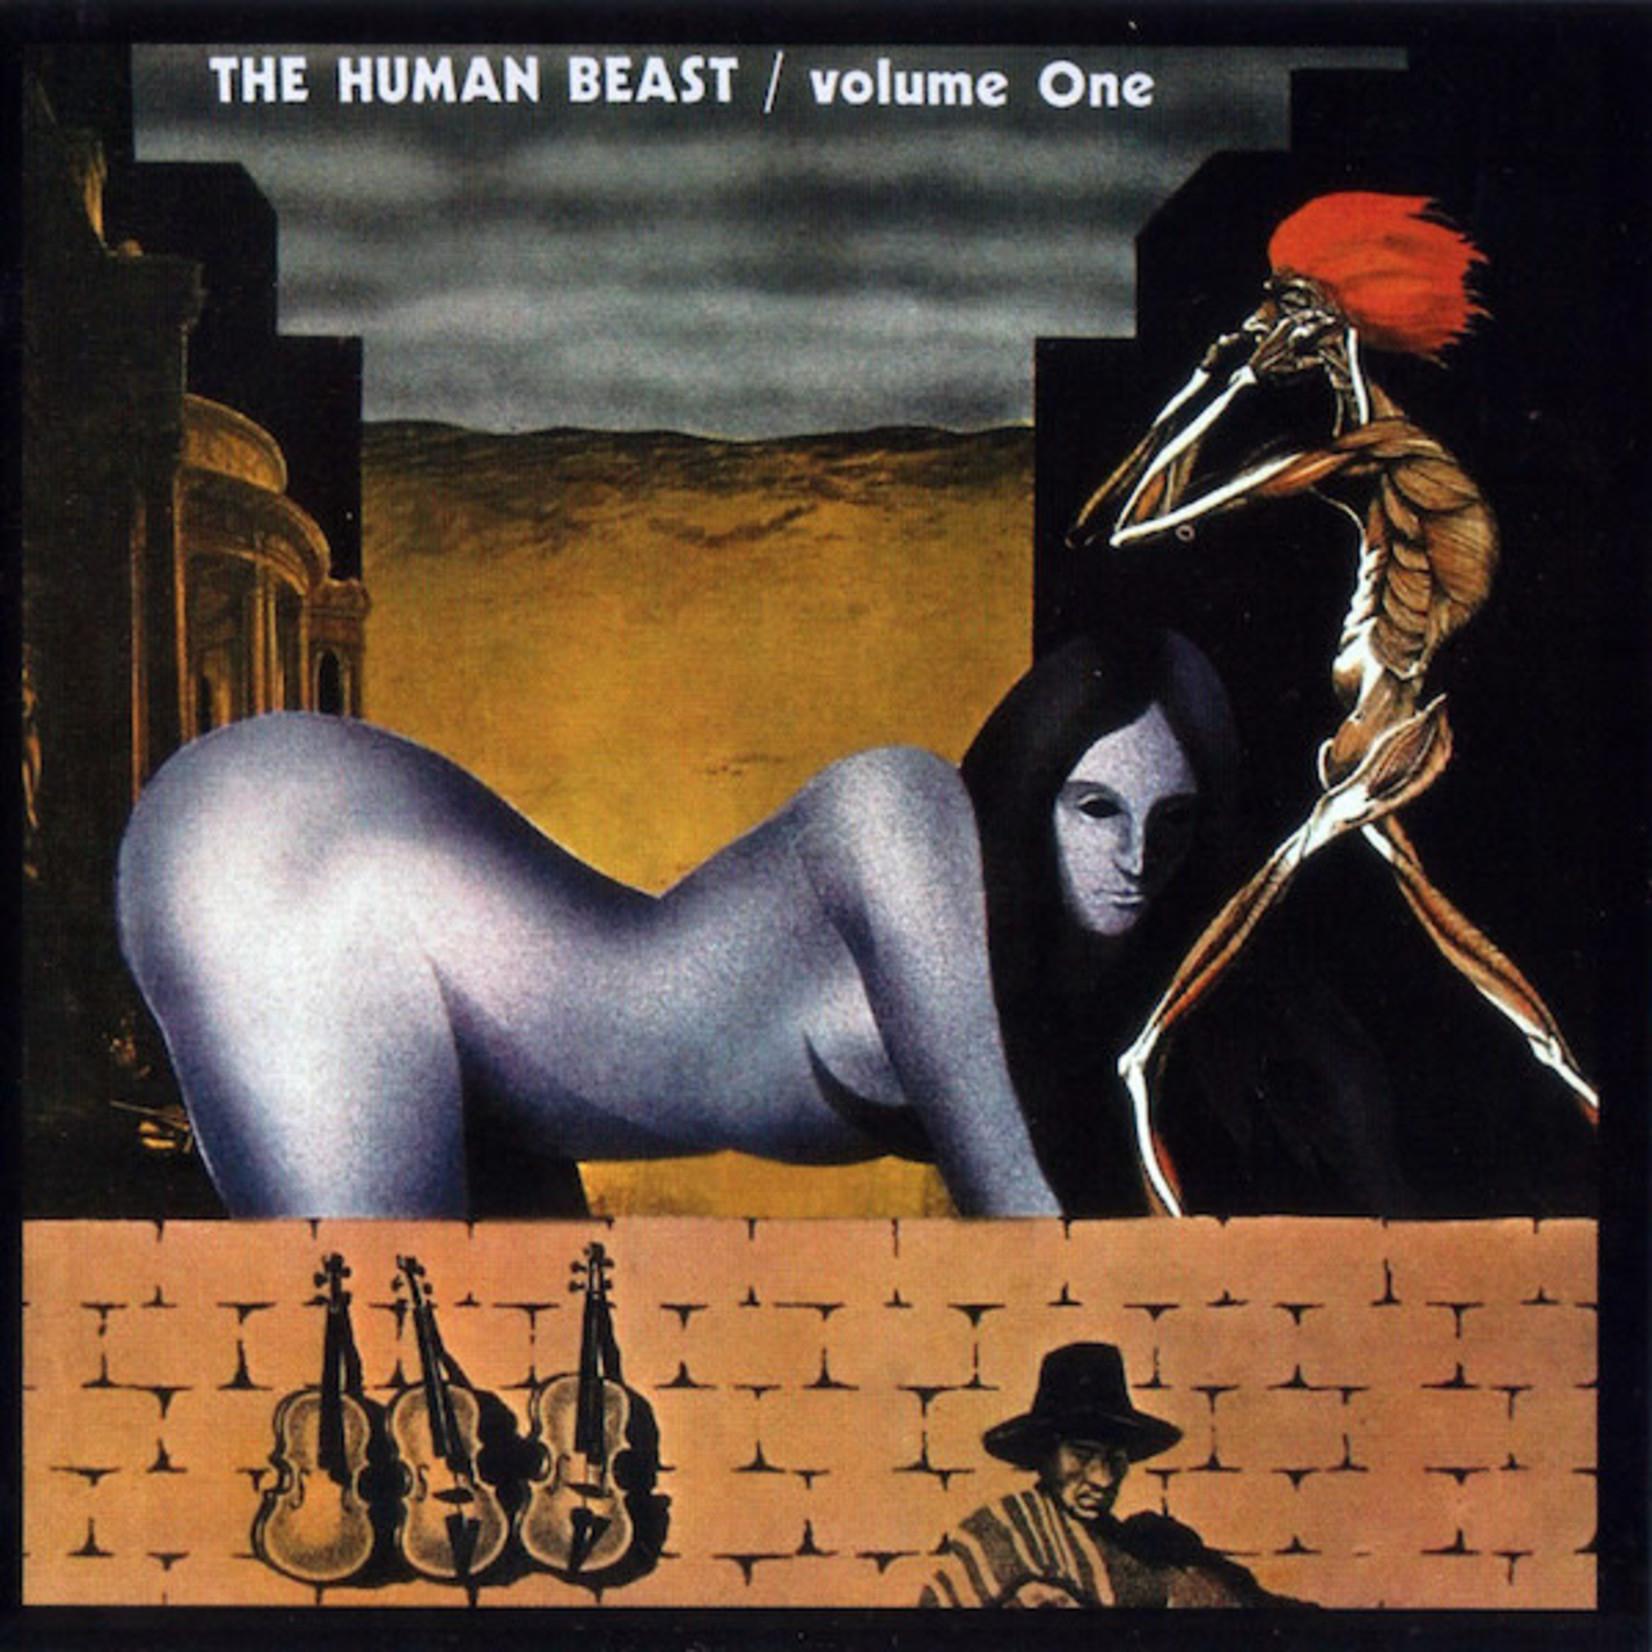 Vinyl The Human Beast - Volume One.  $$